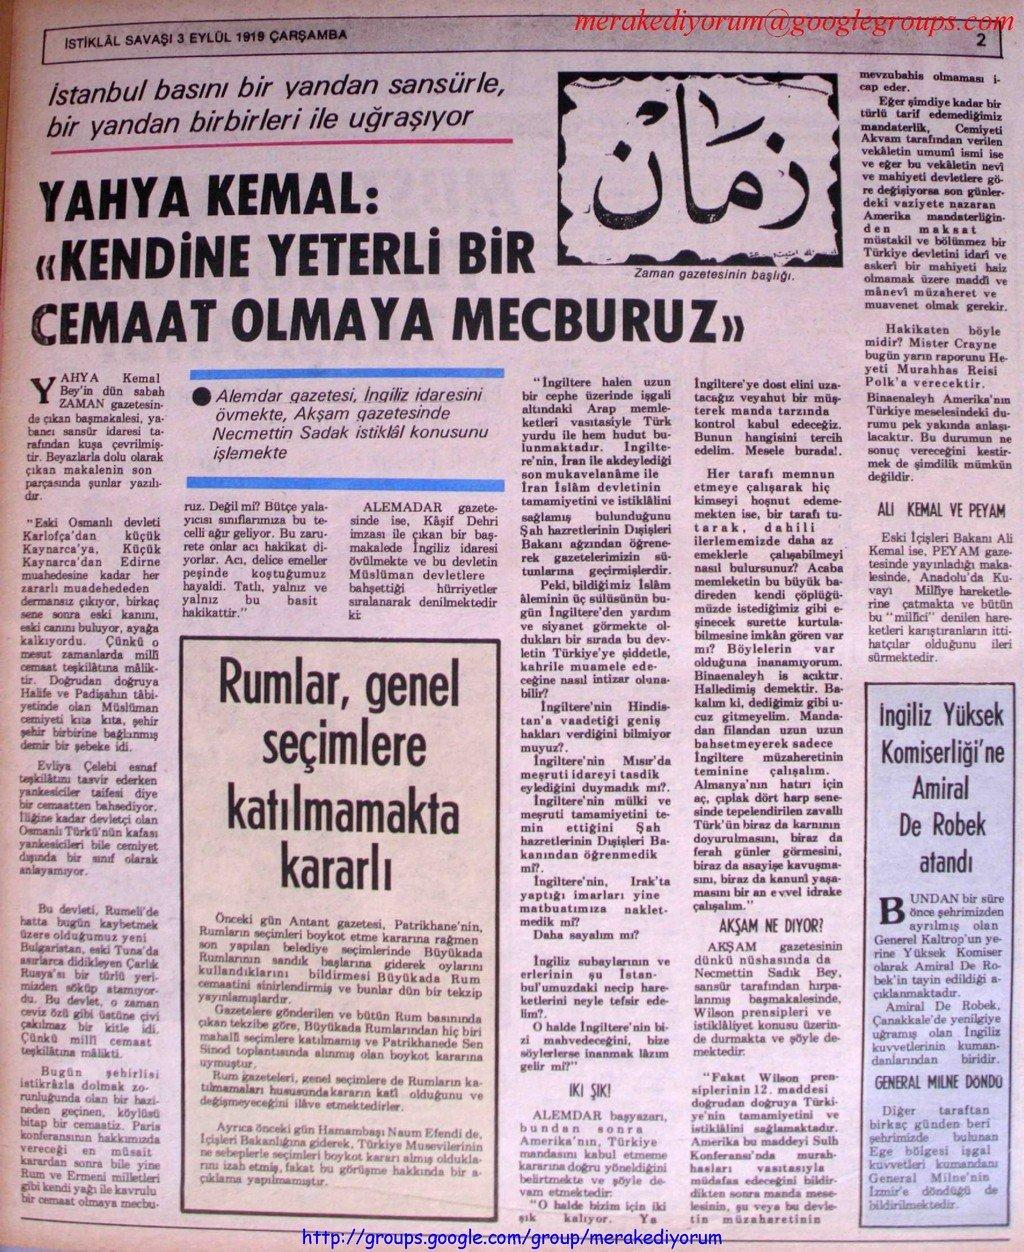 istiklal savaşı gazetesi - 3 eylül 1919